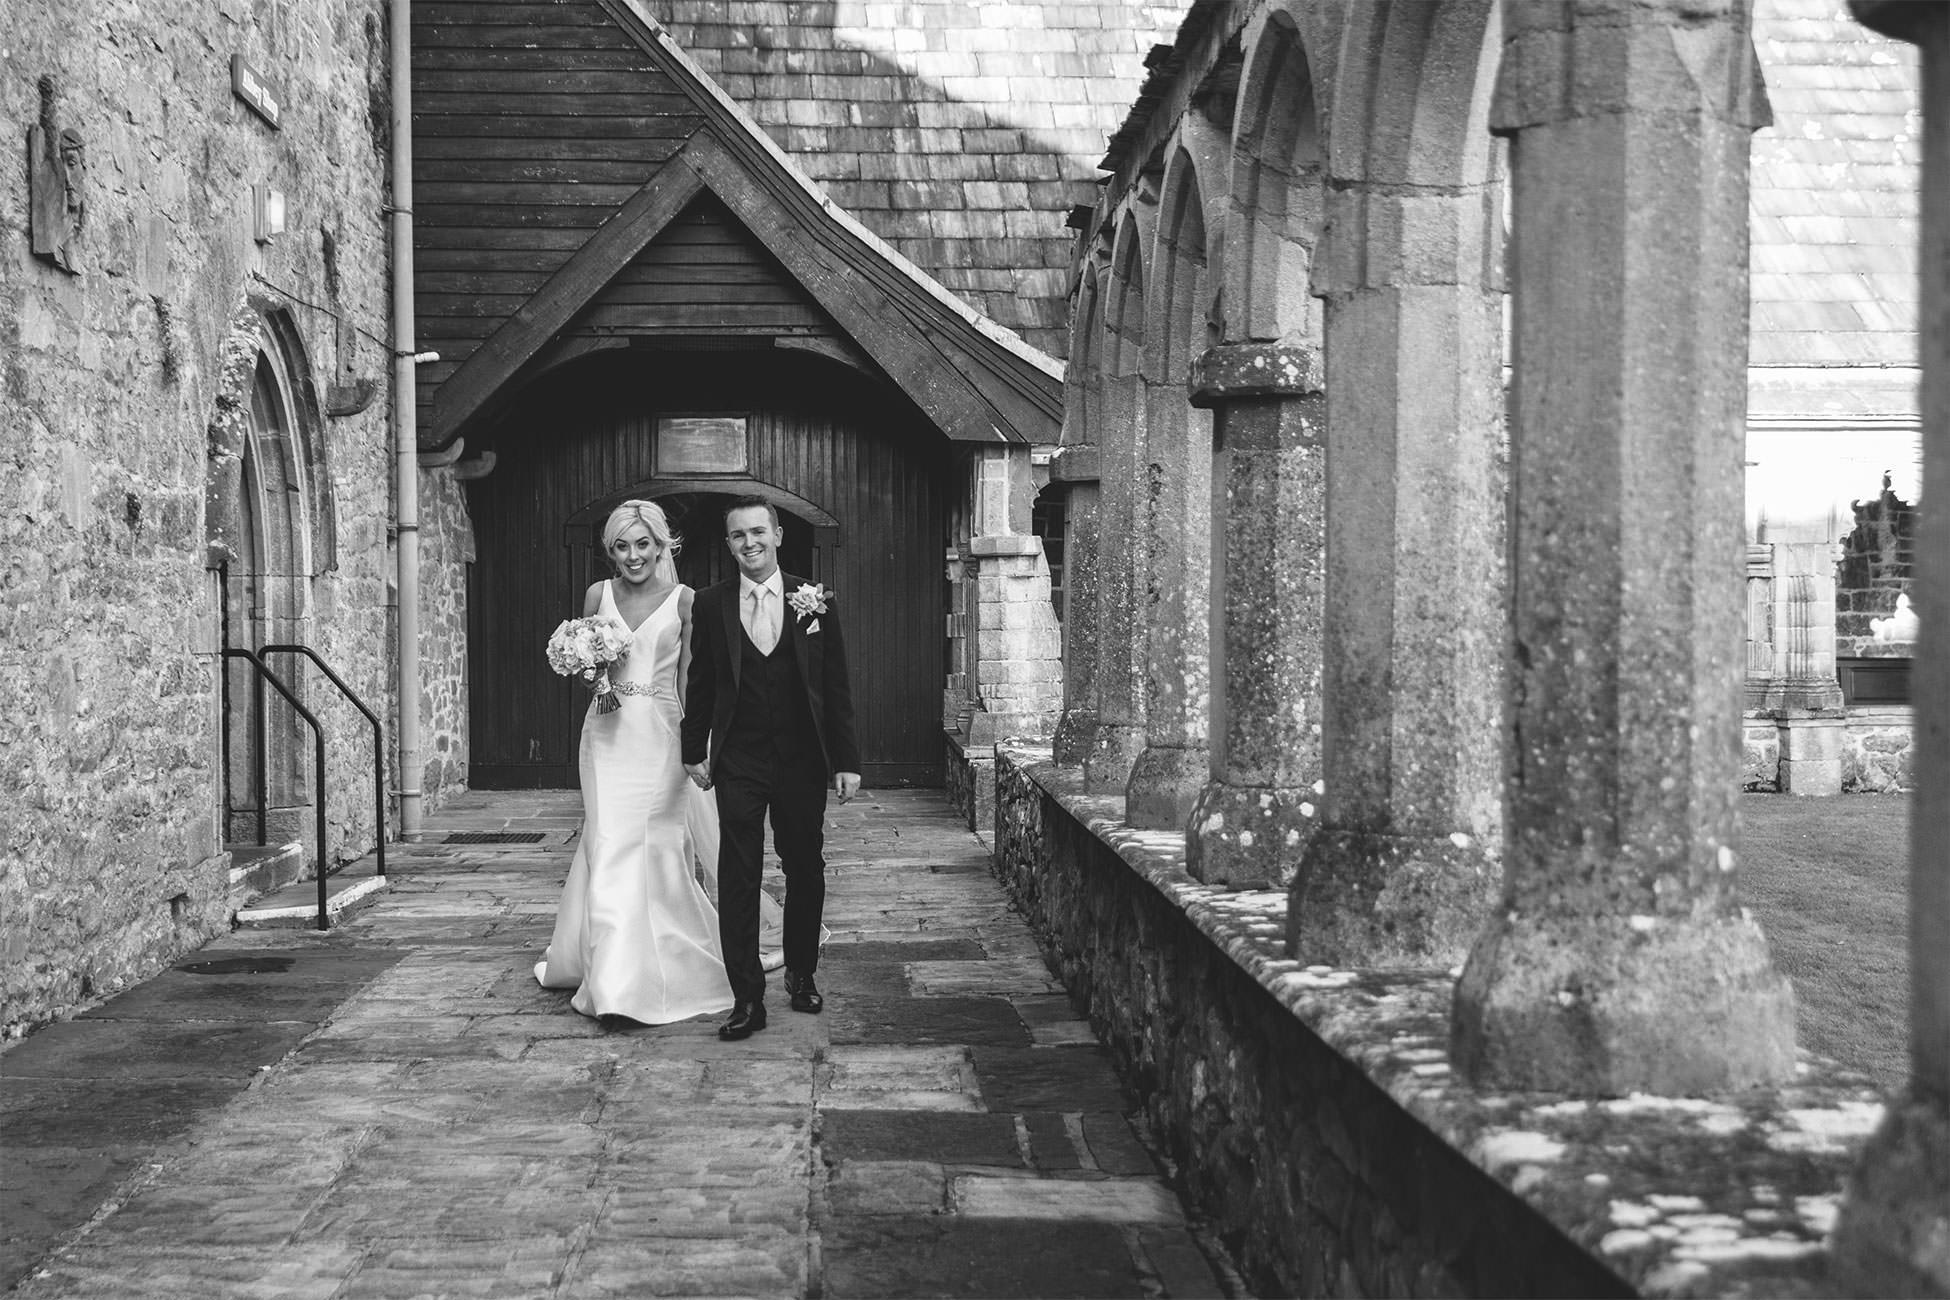 Best Tipperary Wedding Photographer 2020